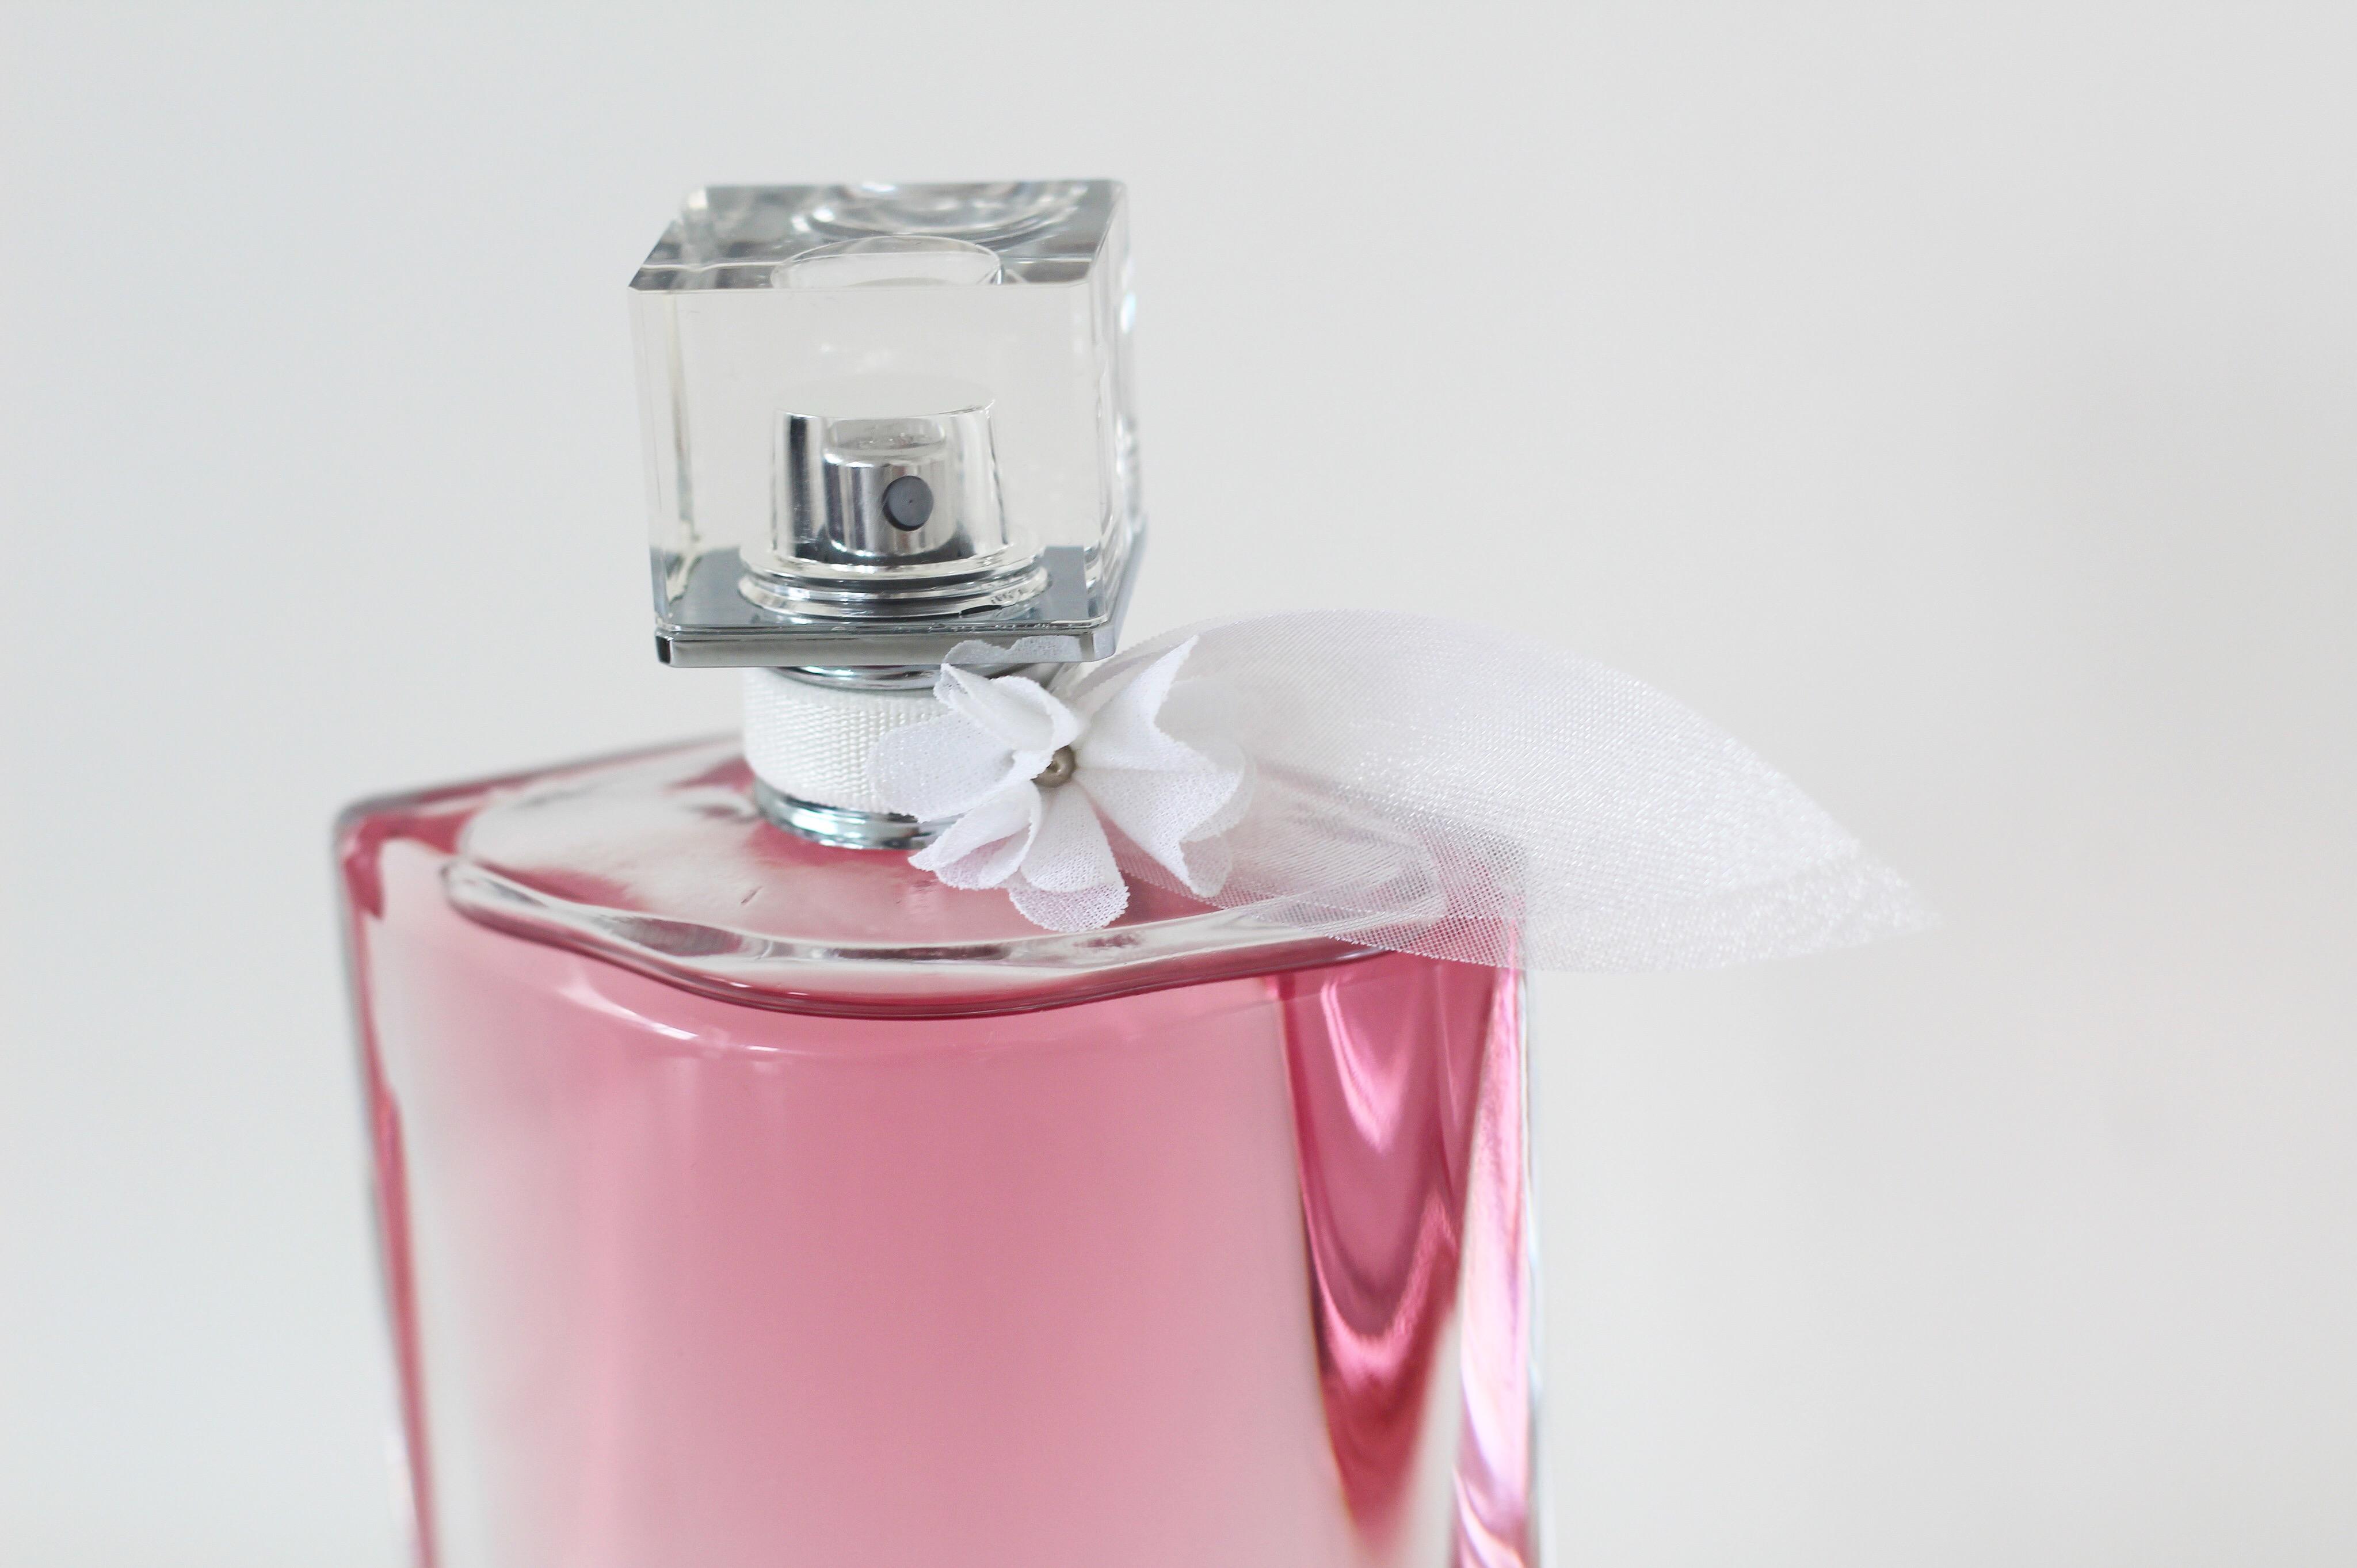 parfum ruik je in gasfase